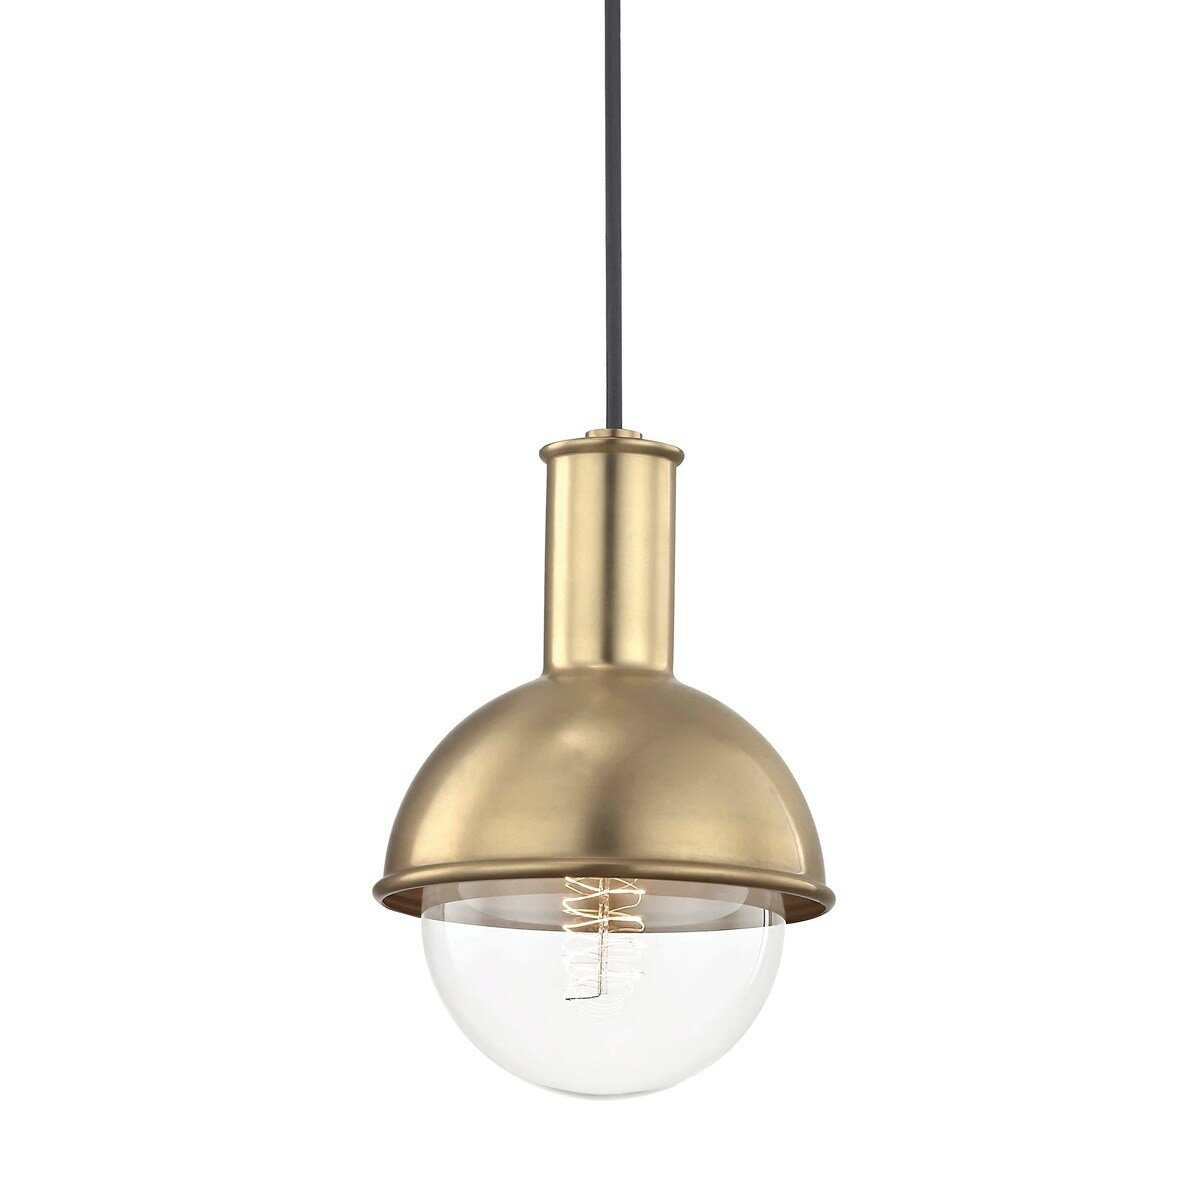 Altamirano 1 Light 60w Inverted Pendant Within Devereaux 1 Light Single Globe Pendants (View 22 of 30)